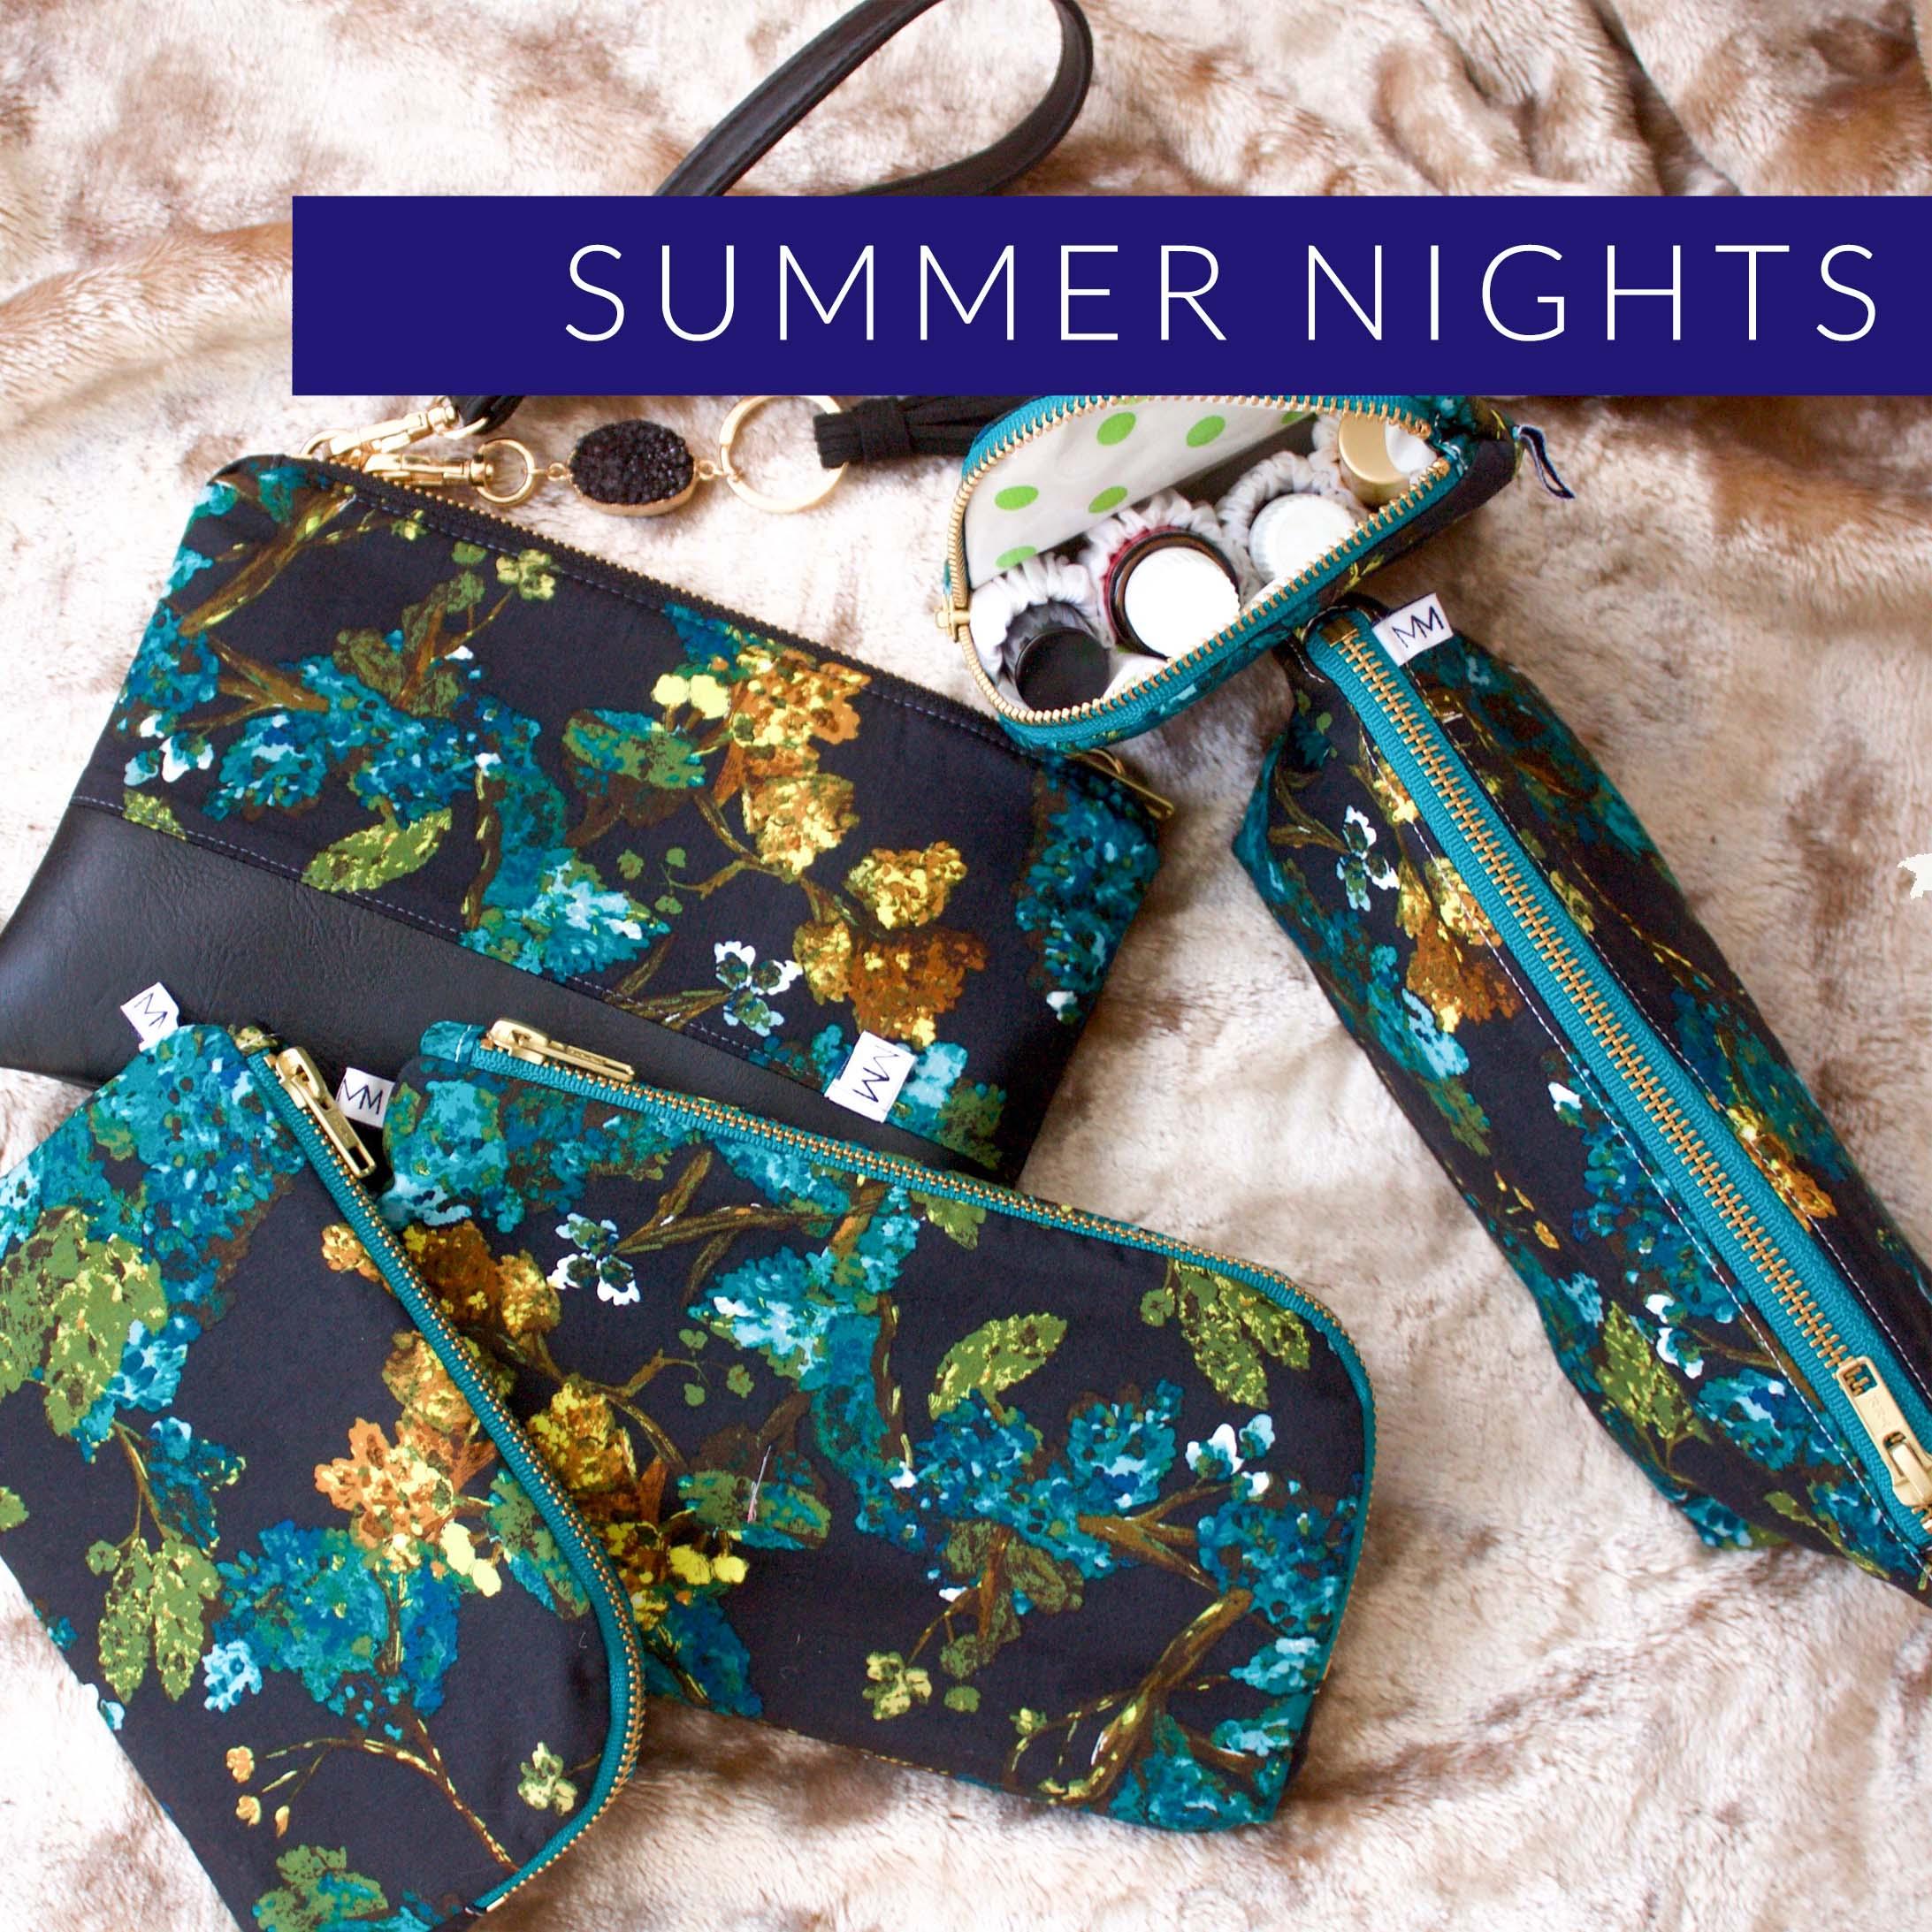 summer nights icon.jpg